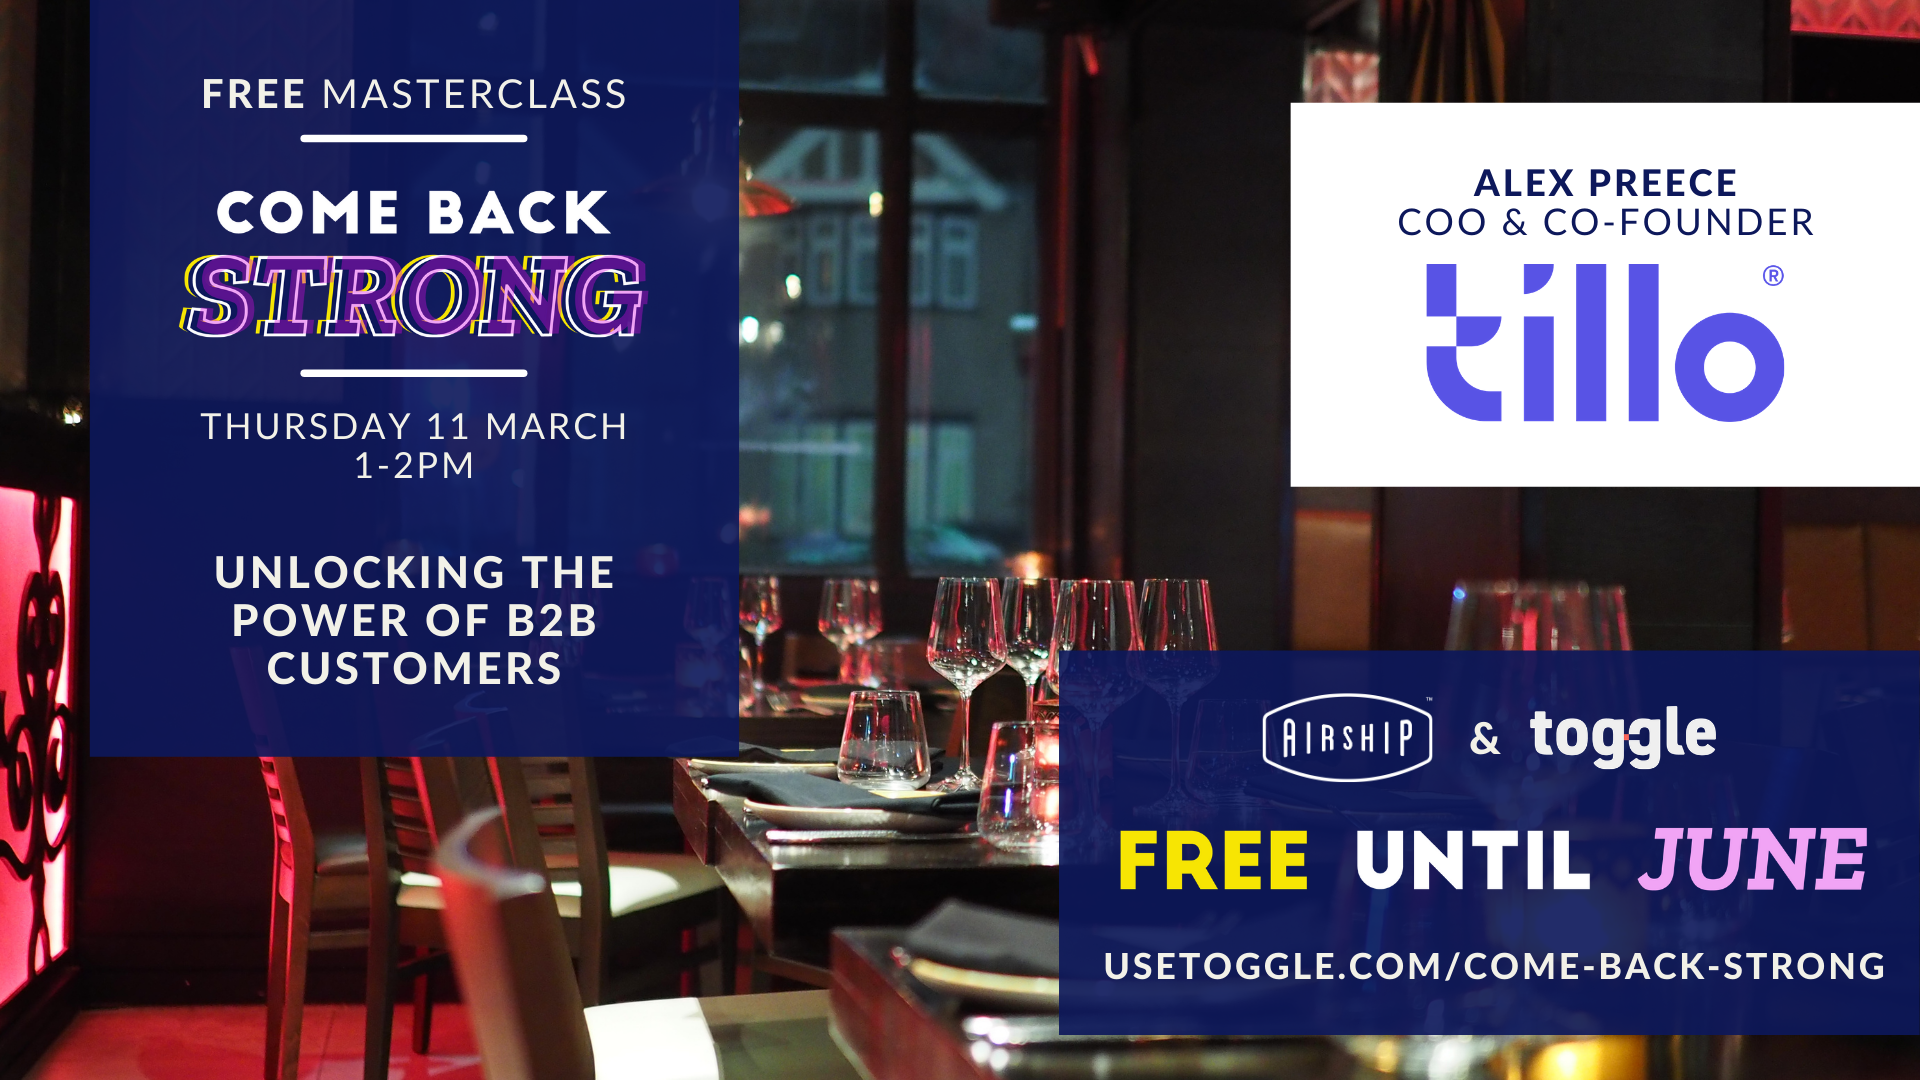 #ComeBackStrong Masterclass: Unlocking the Power of B2B Customers for Hospitality